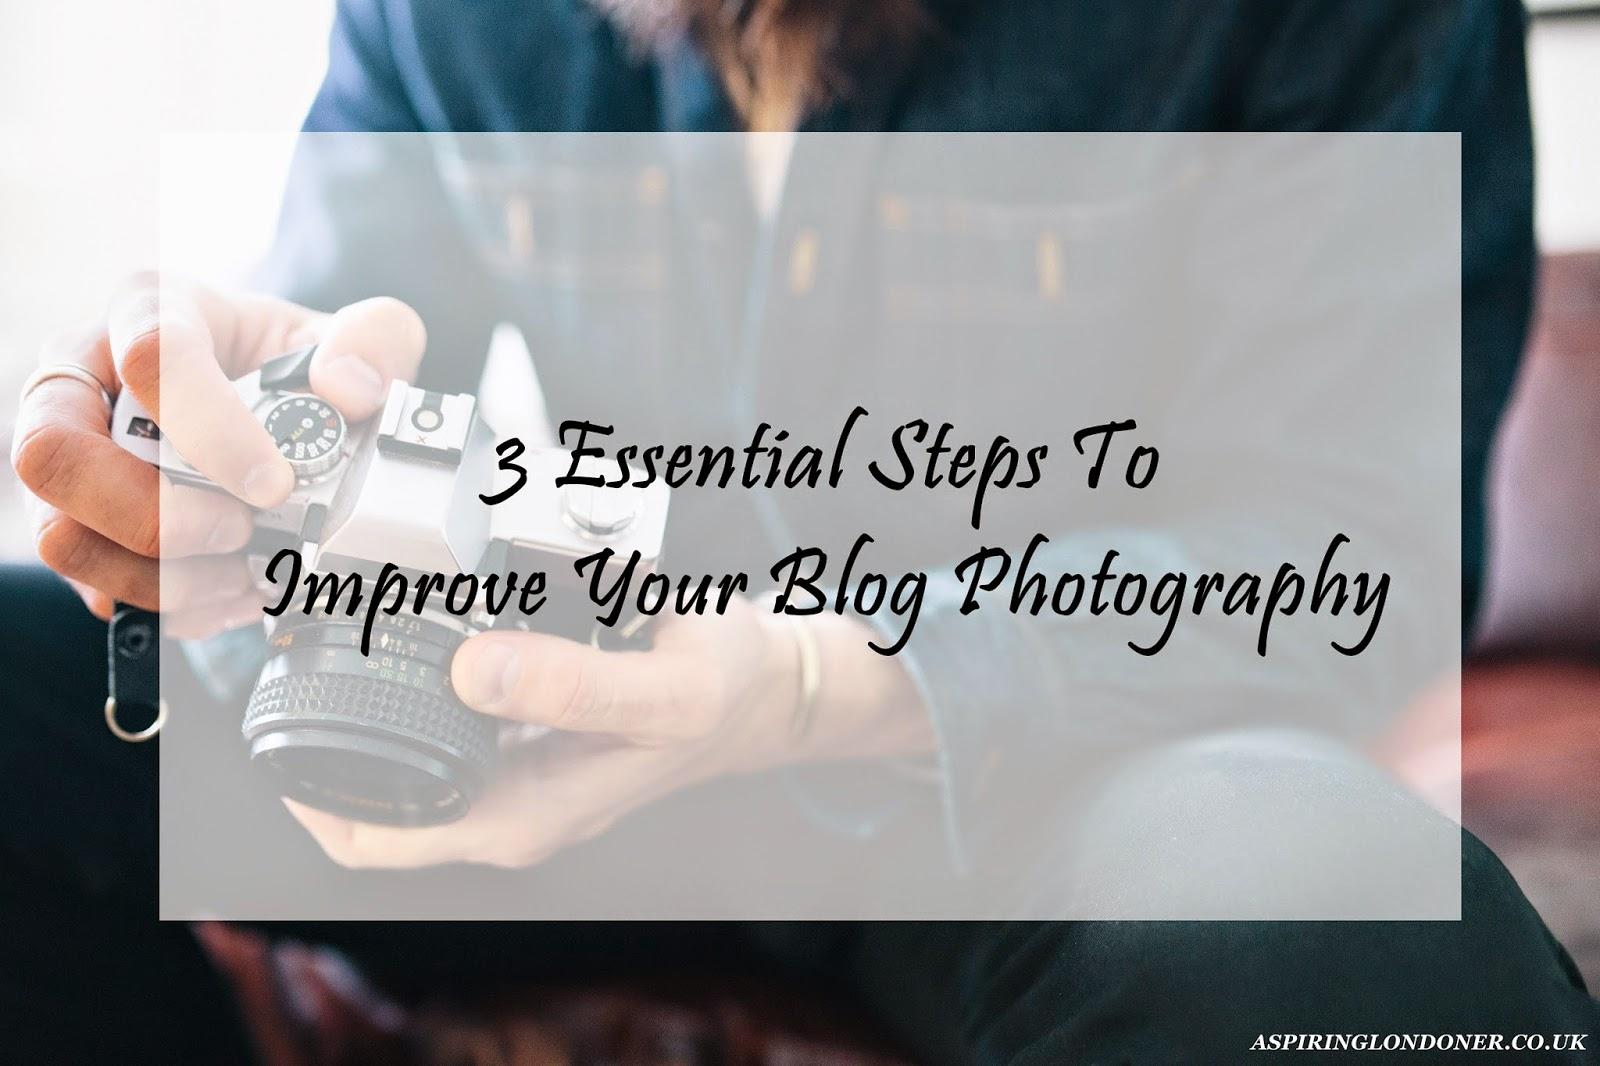 3 Essential Steps To Improve Your Blog Photography - Aspiring Londoner